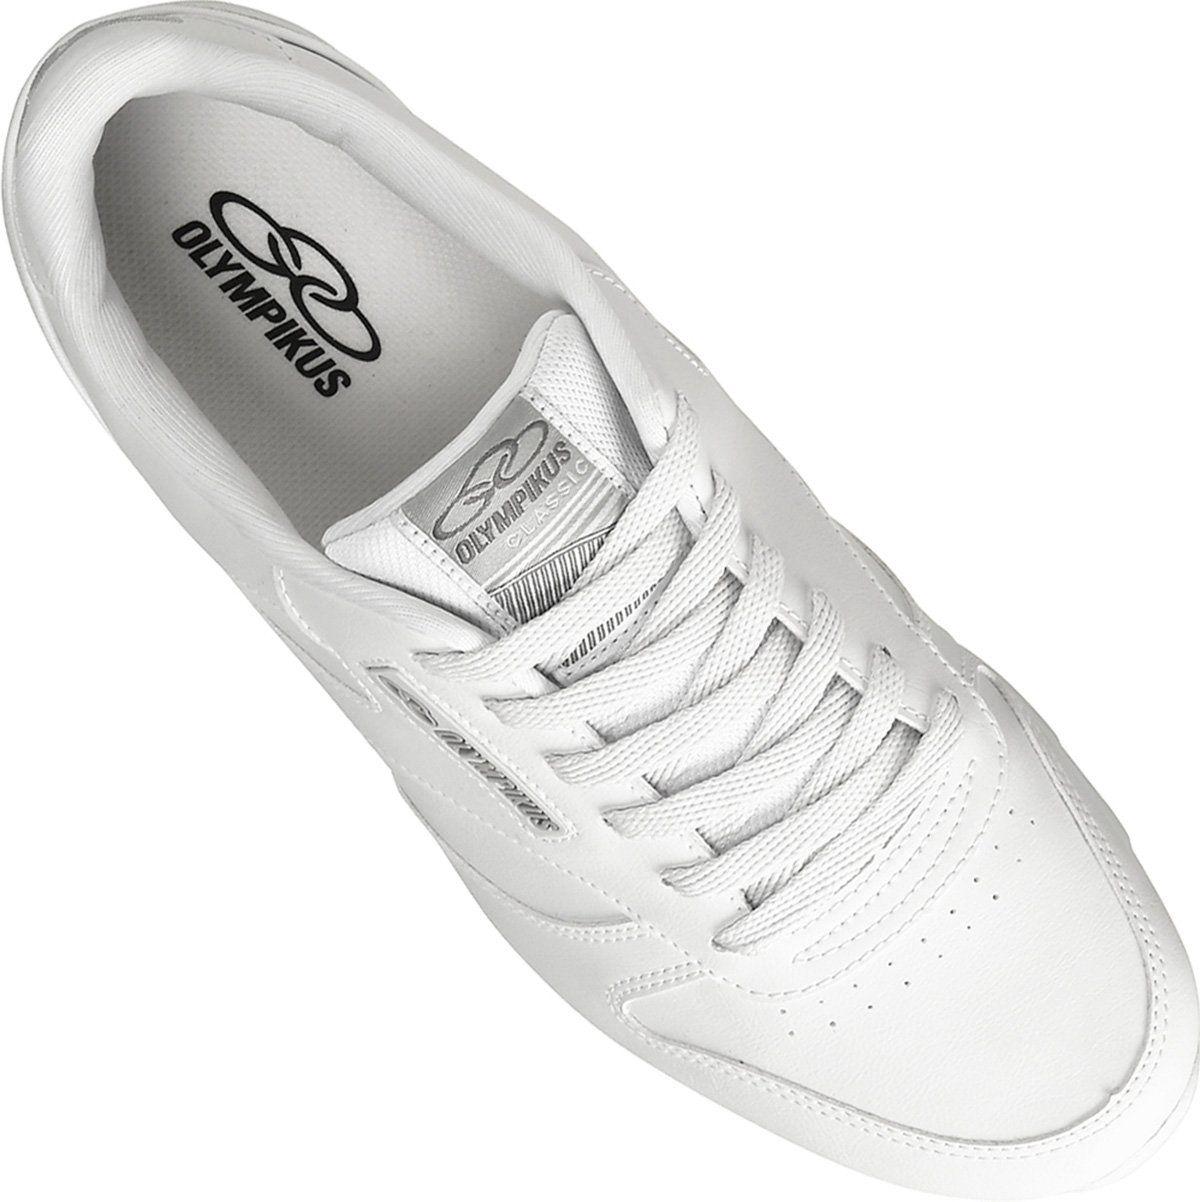 Tenis Olympikus Masculino Jogging / 100 - 405003138